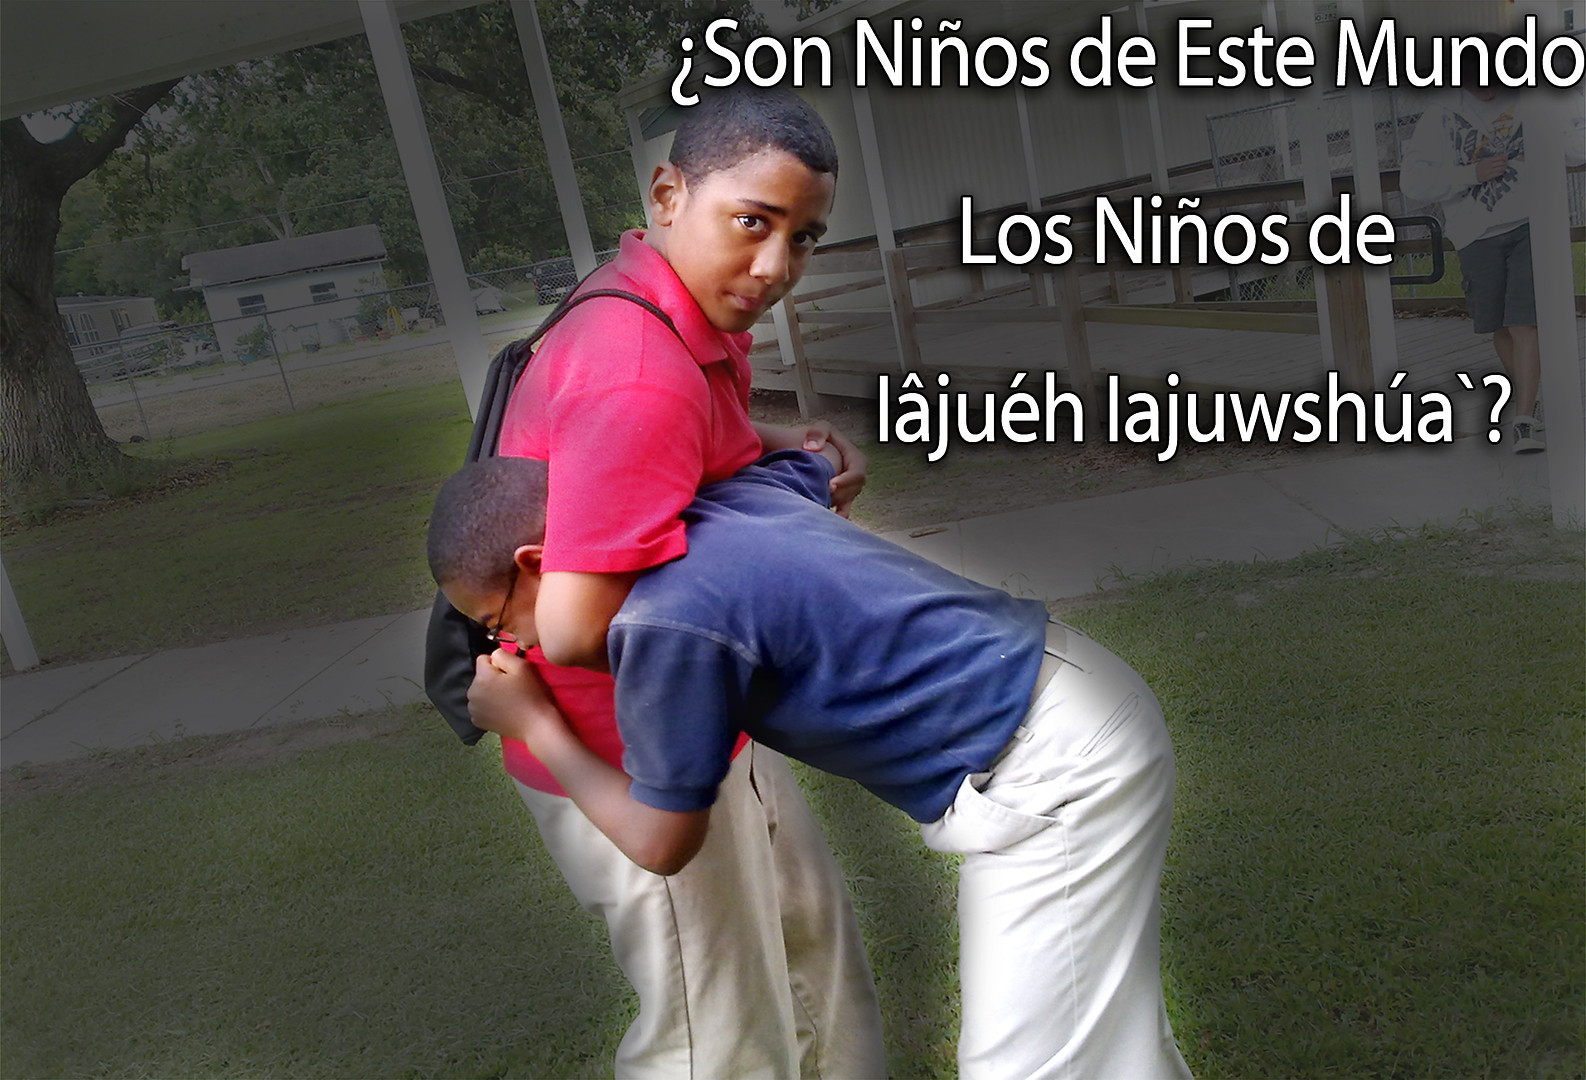 black-children-fighting-espanol.jpg